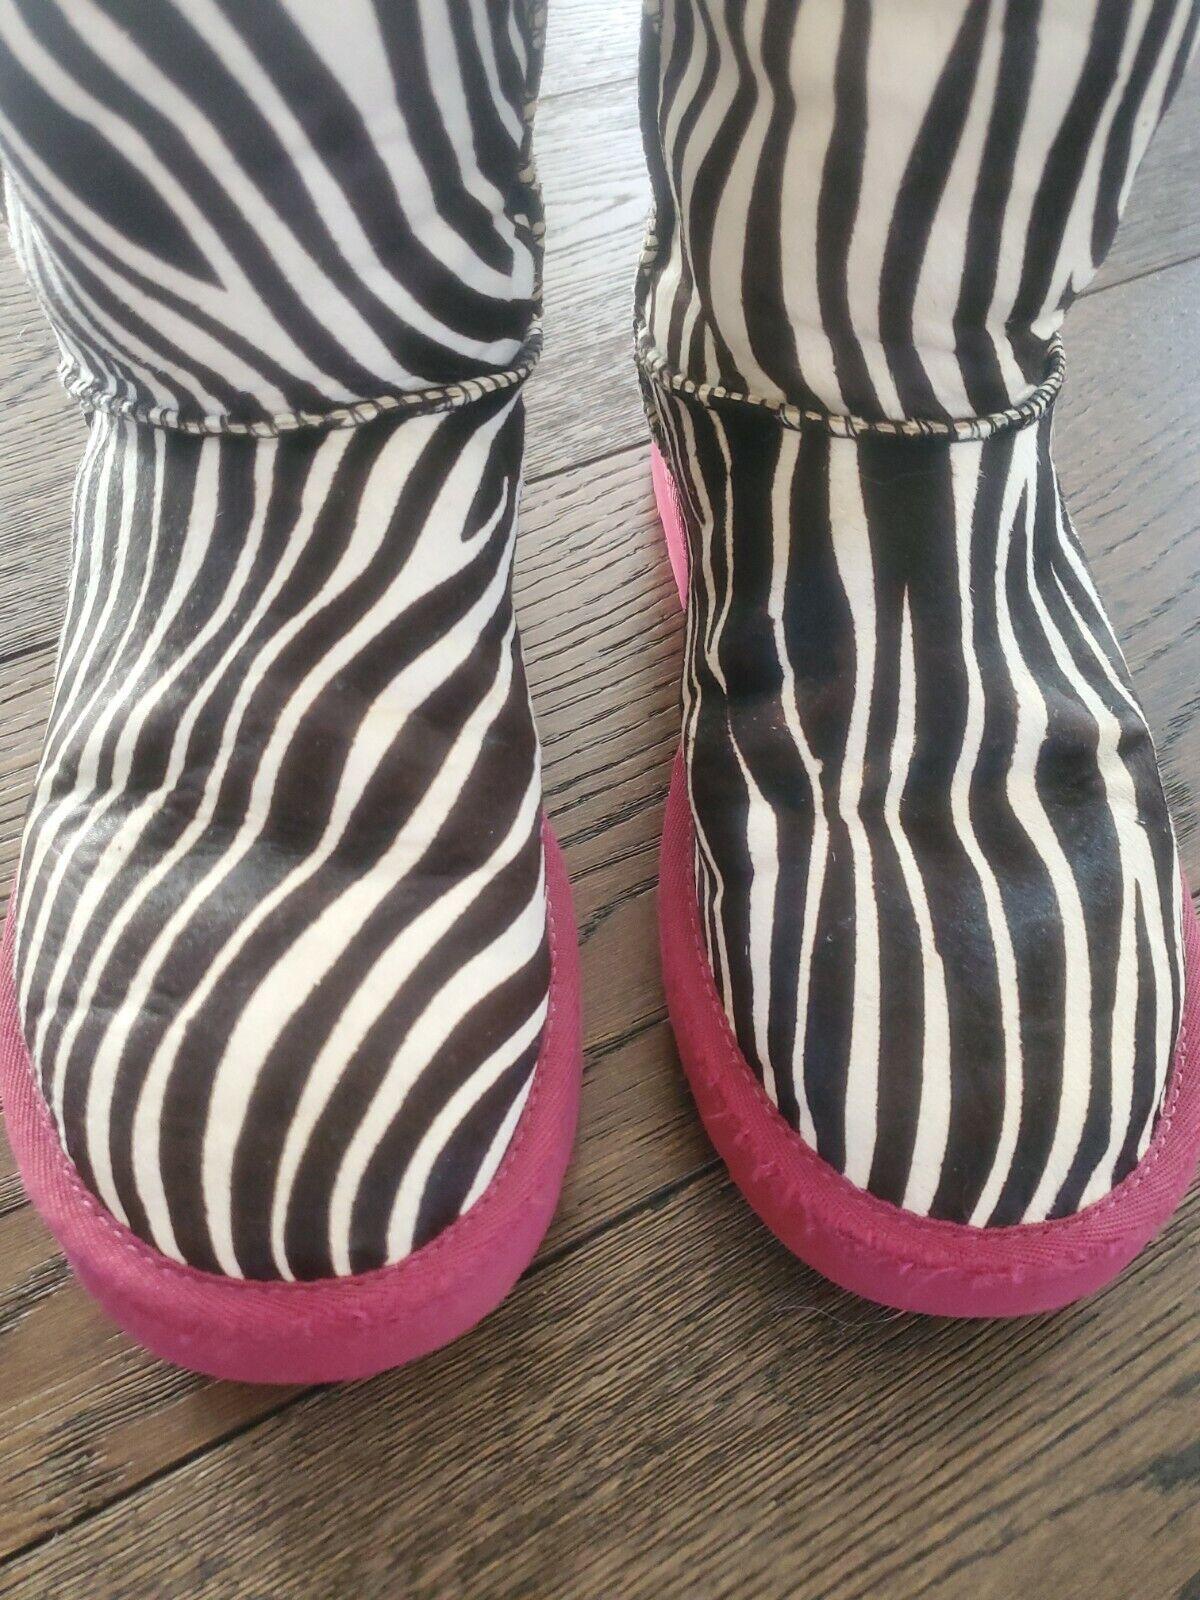 UGG Zebra Boots - image 7